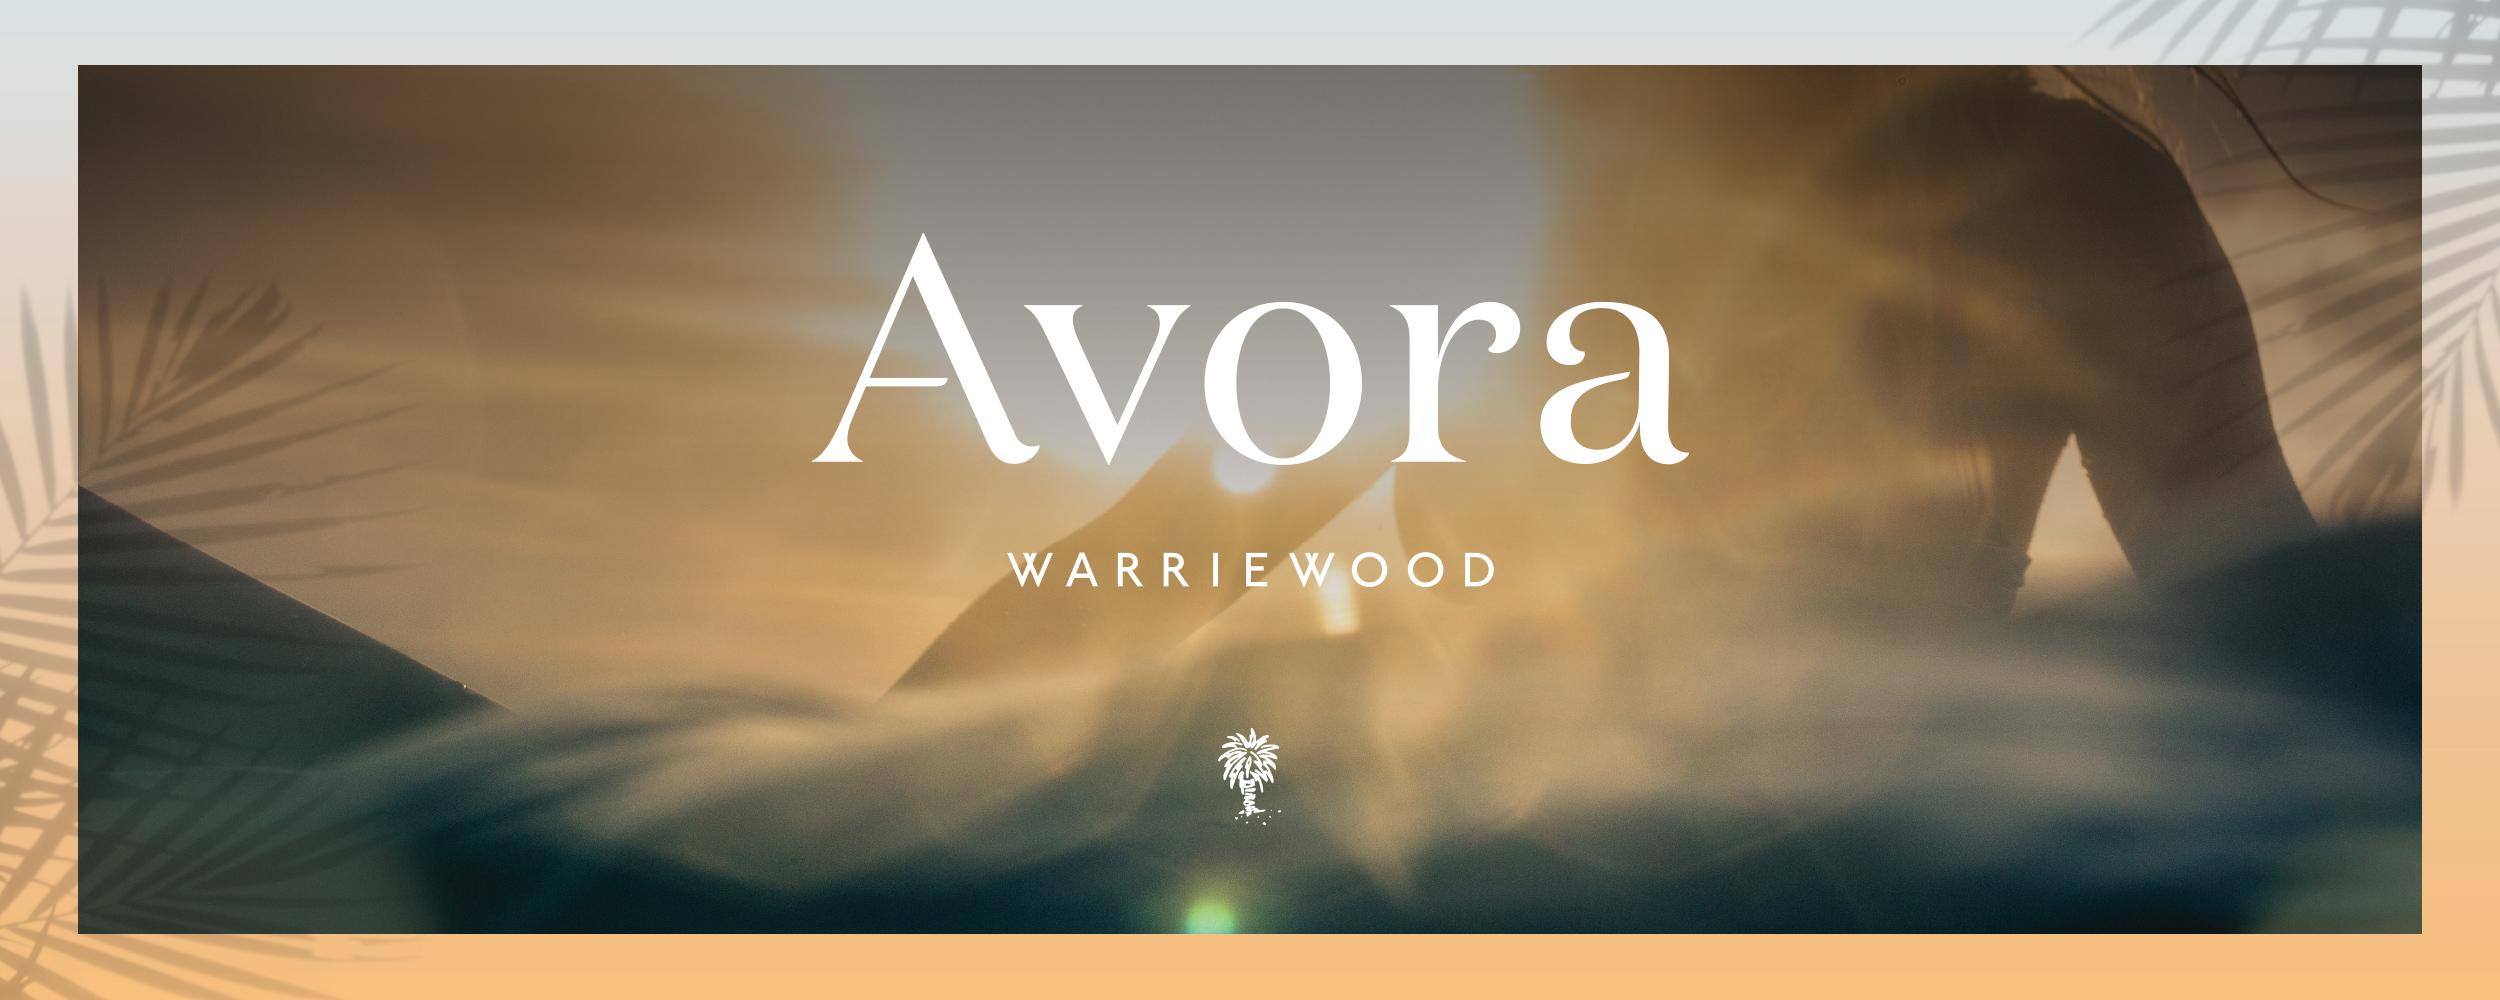 TNG-avora-warriewood.jpg